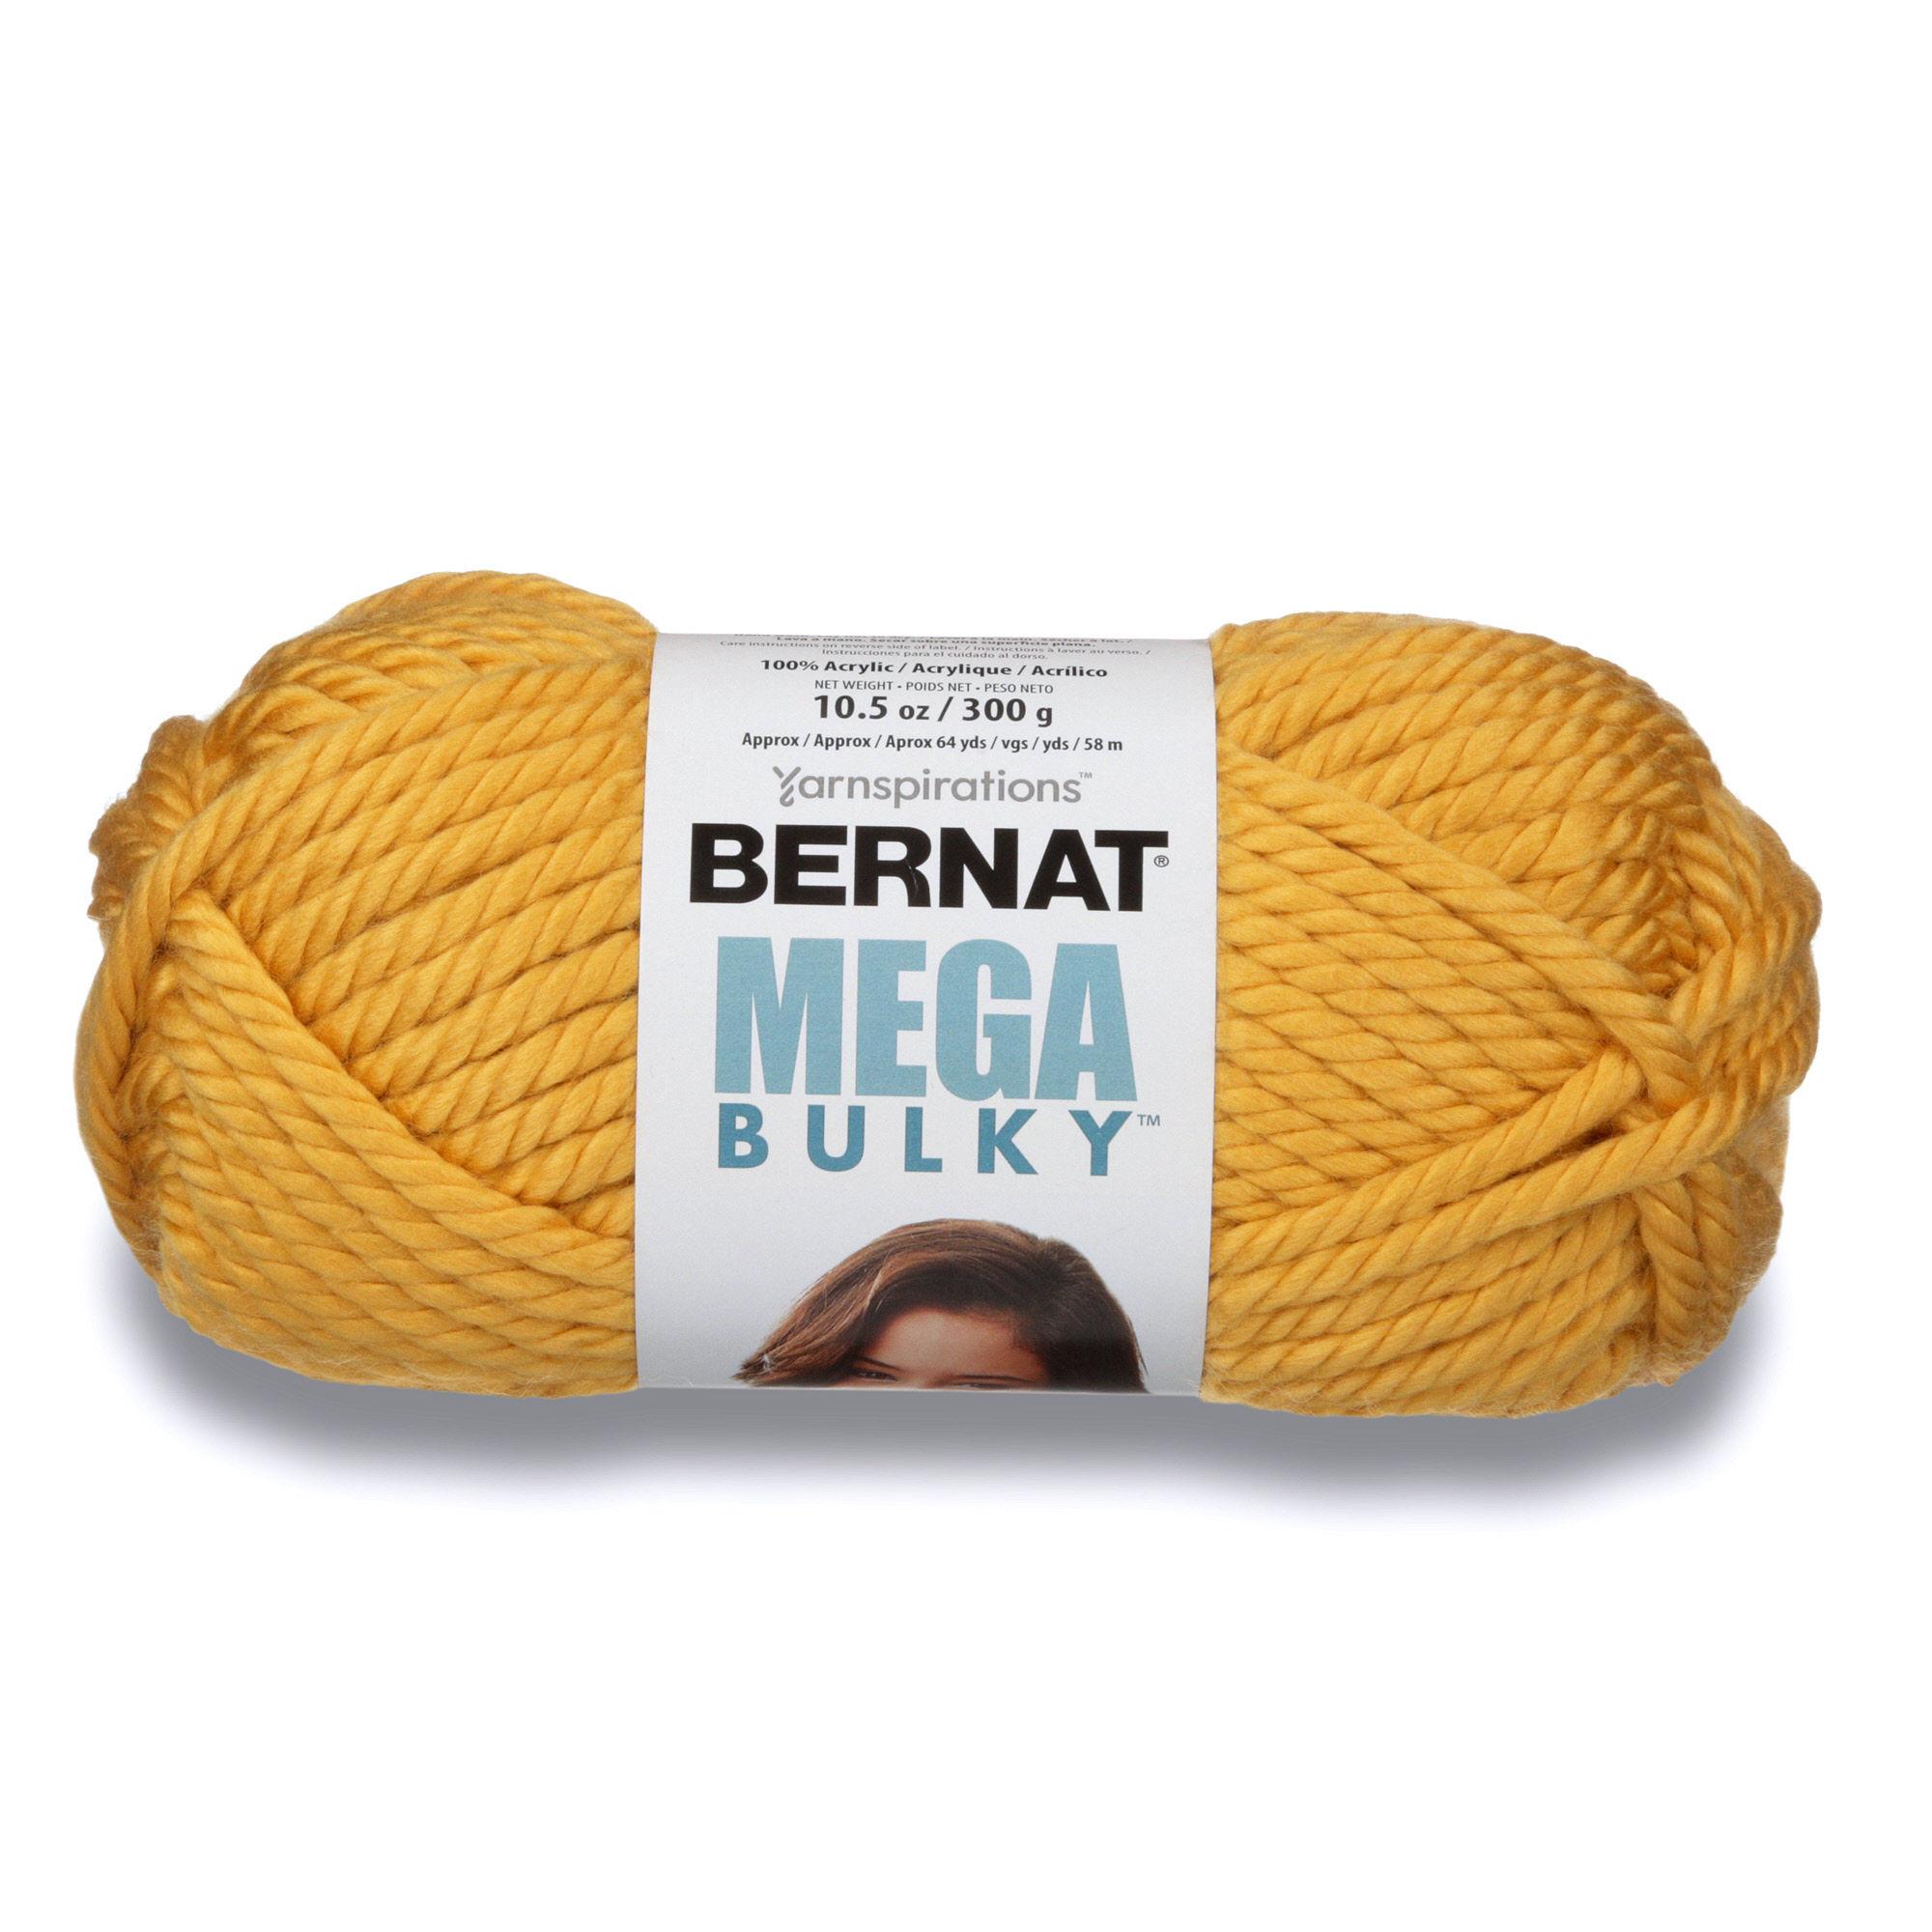 Bernat Mega Bulky Yarn, 300g, Light Grey Heather